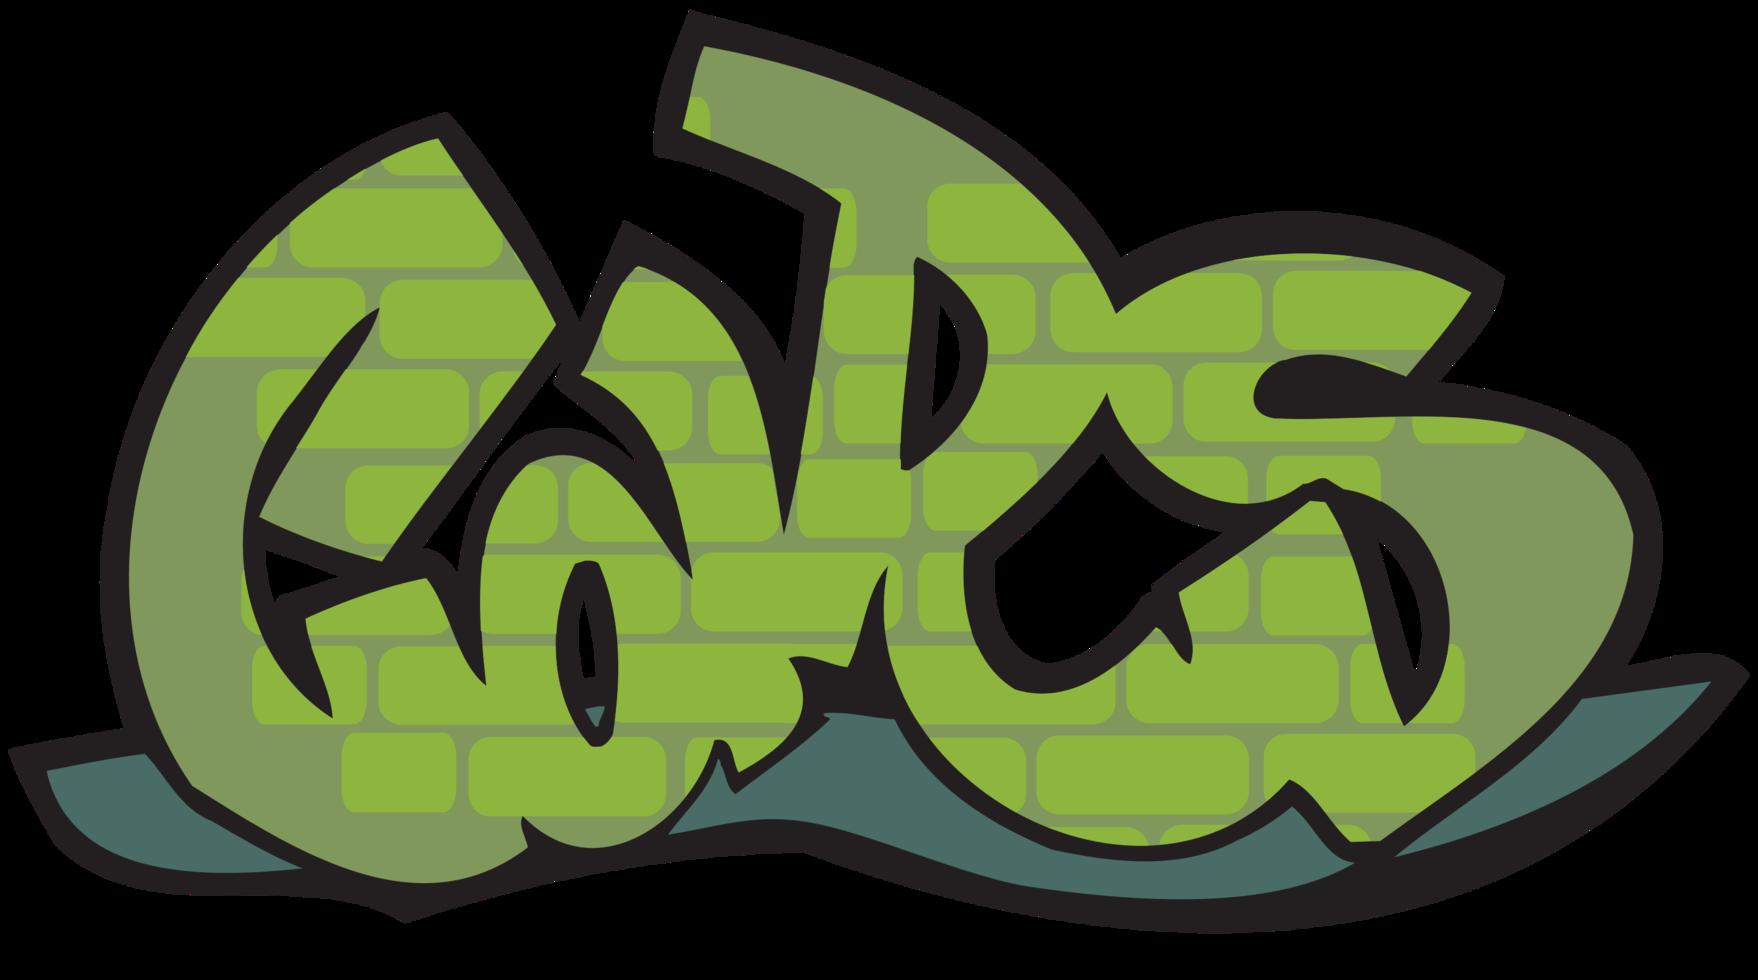 graffiti typografie png